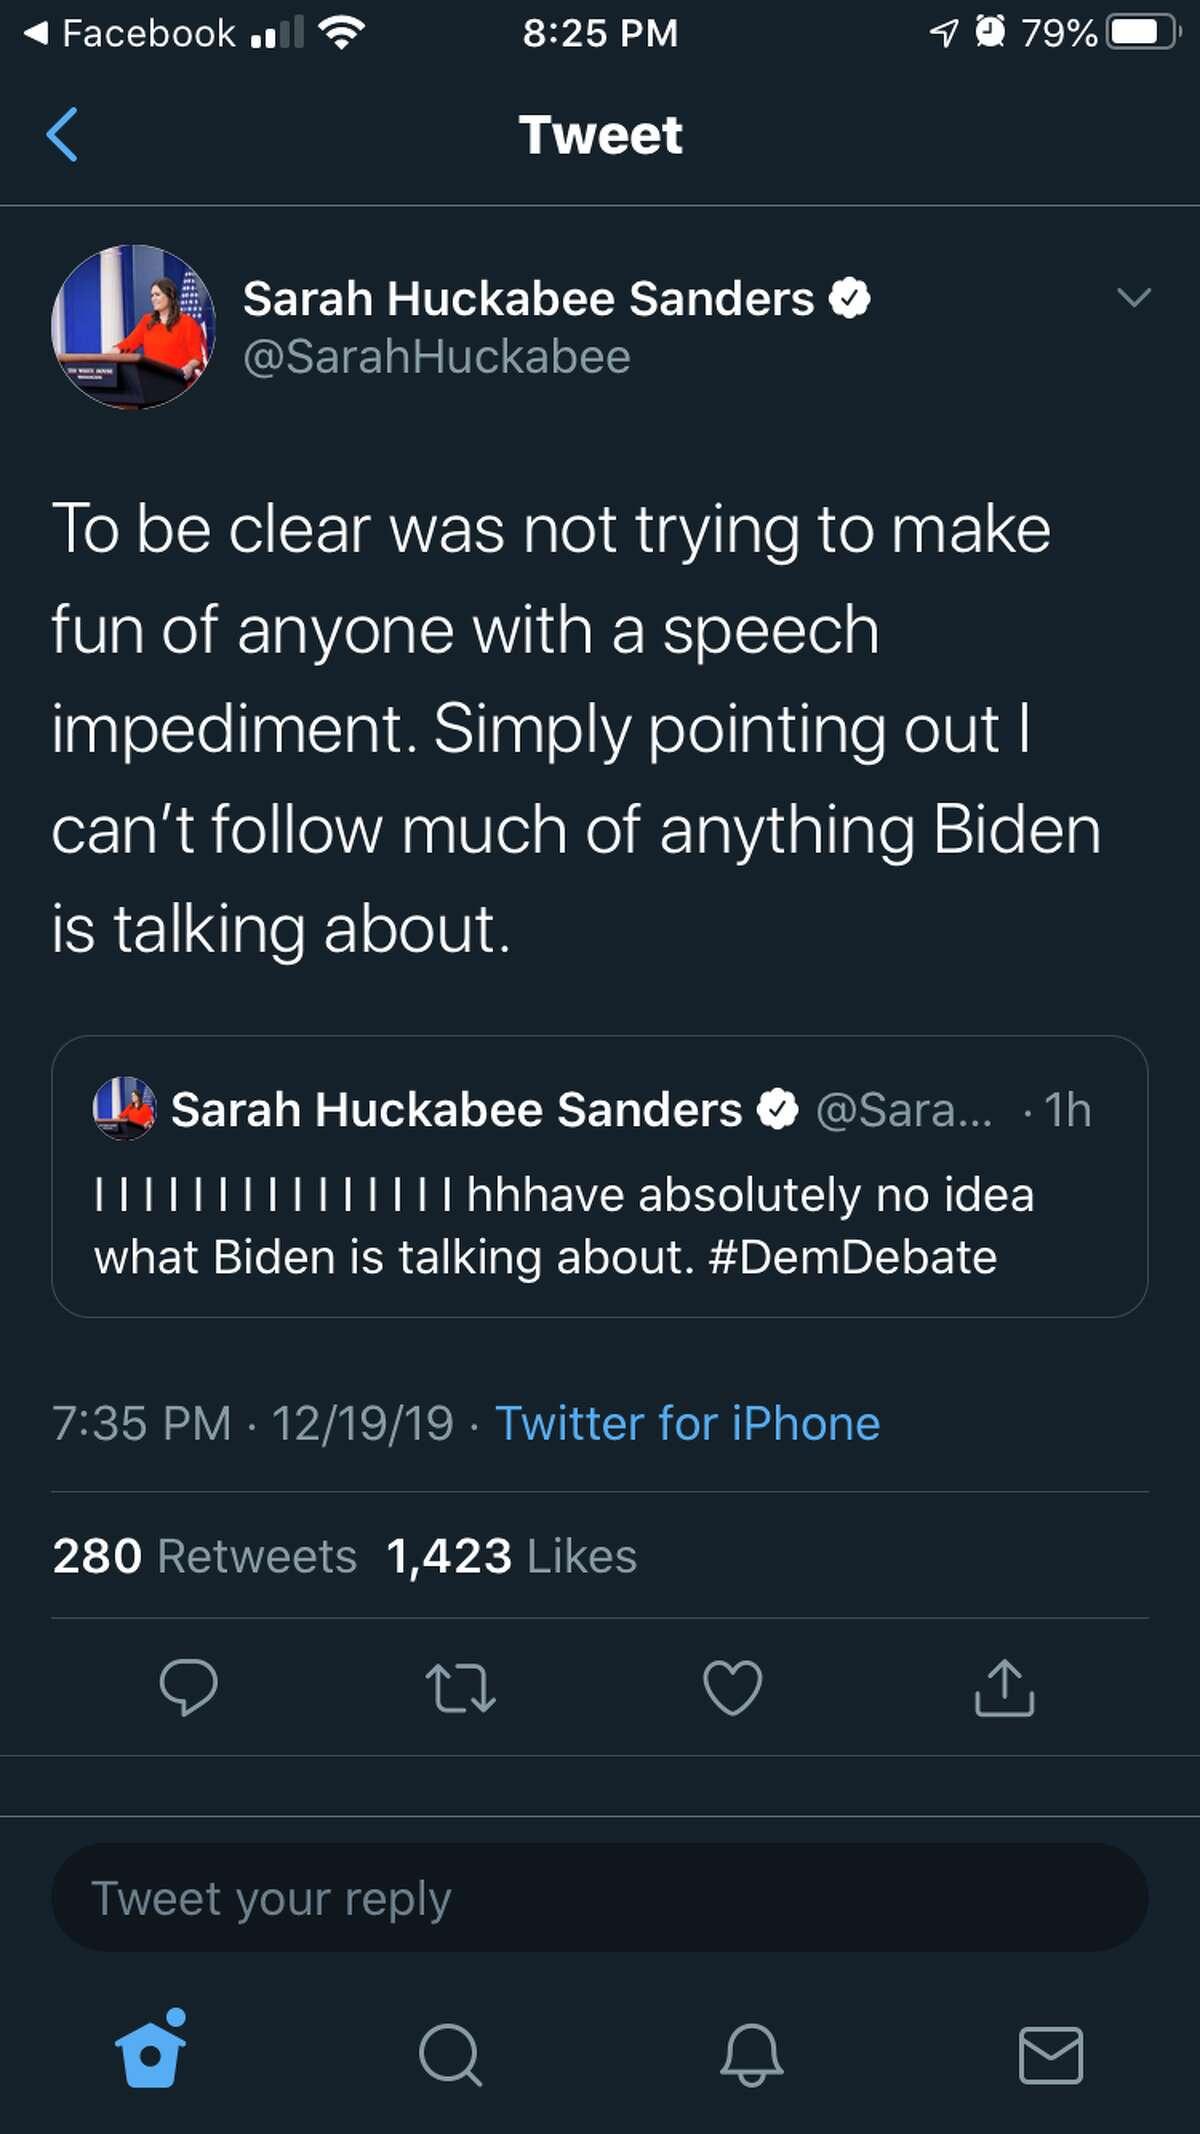 Sarah Huckabee Sander's first attempt to clarify her tweet about former Vice President Joe Biden.